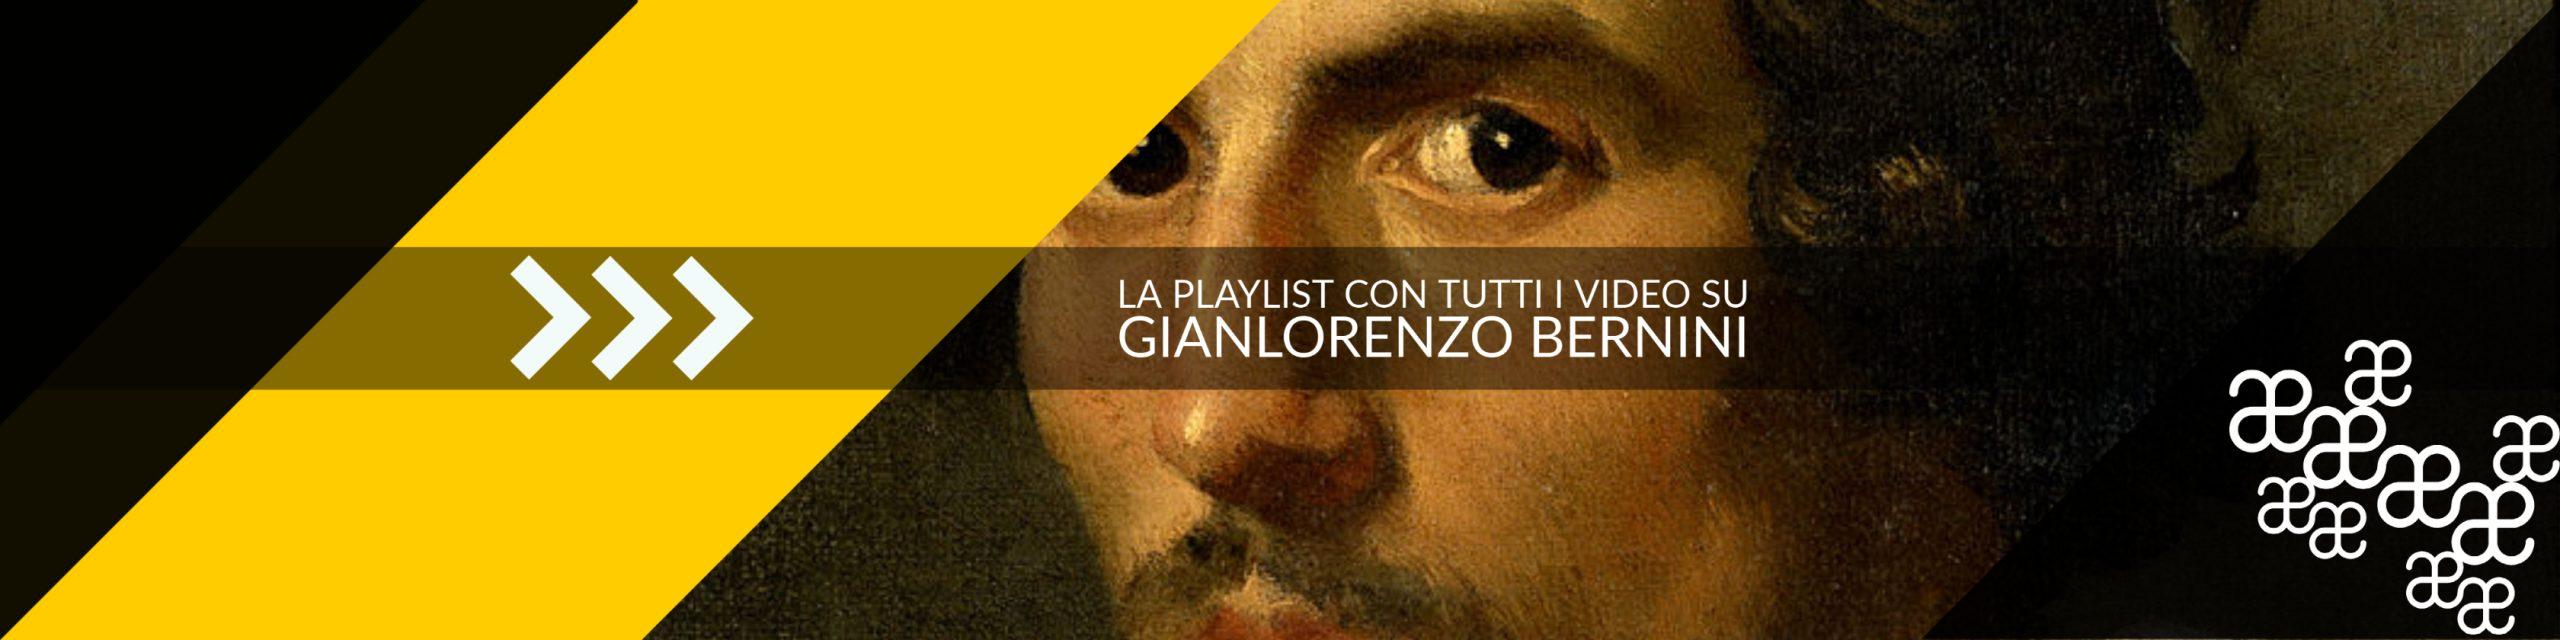 Gianlorenzo Bernini: vita e opere in 10 punti